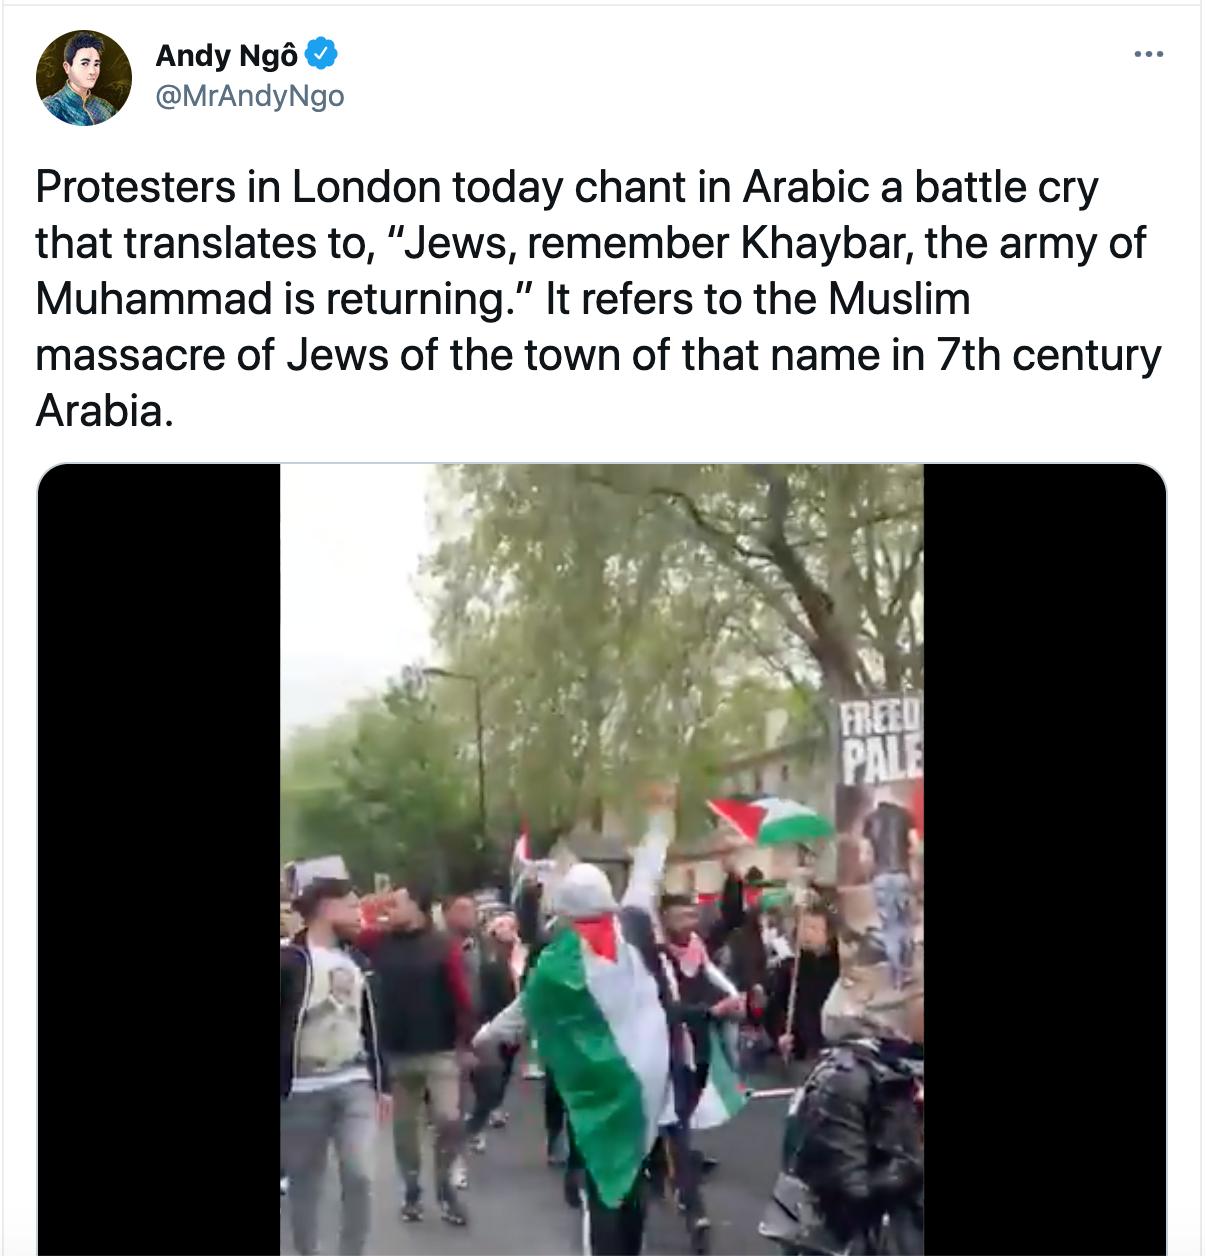 https://www.jihadwatch.org/wp-content/uploads/2021/05/Khaybar-London-Ngo.png